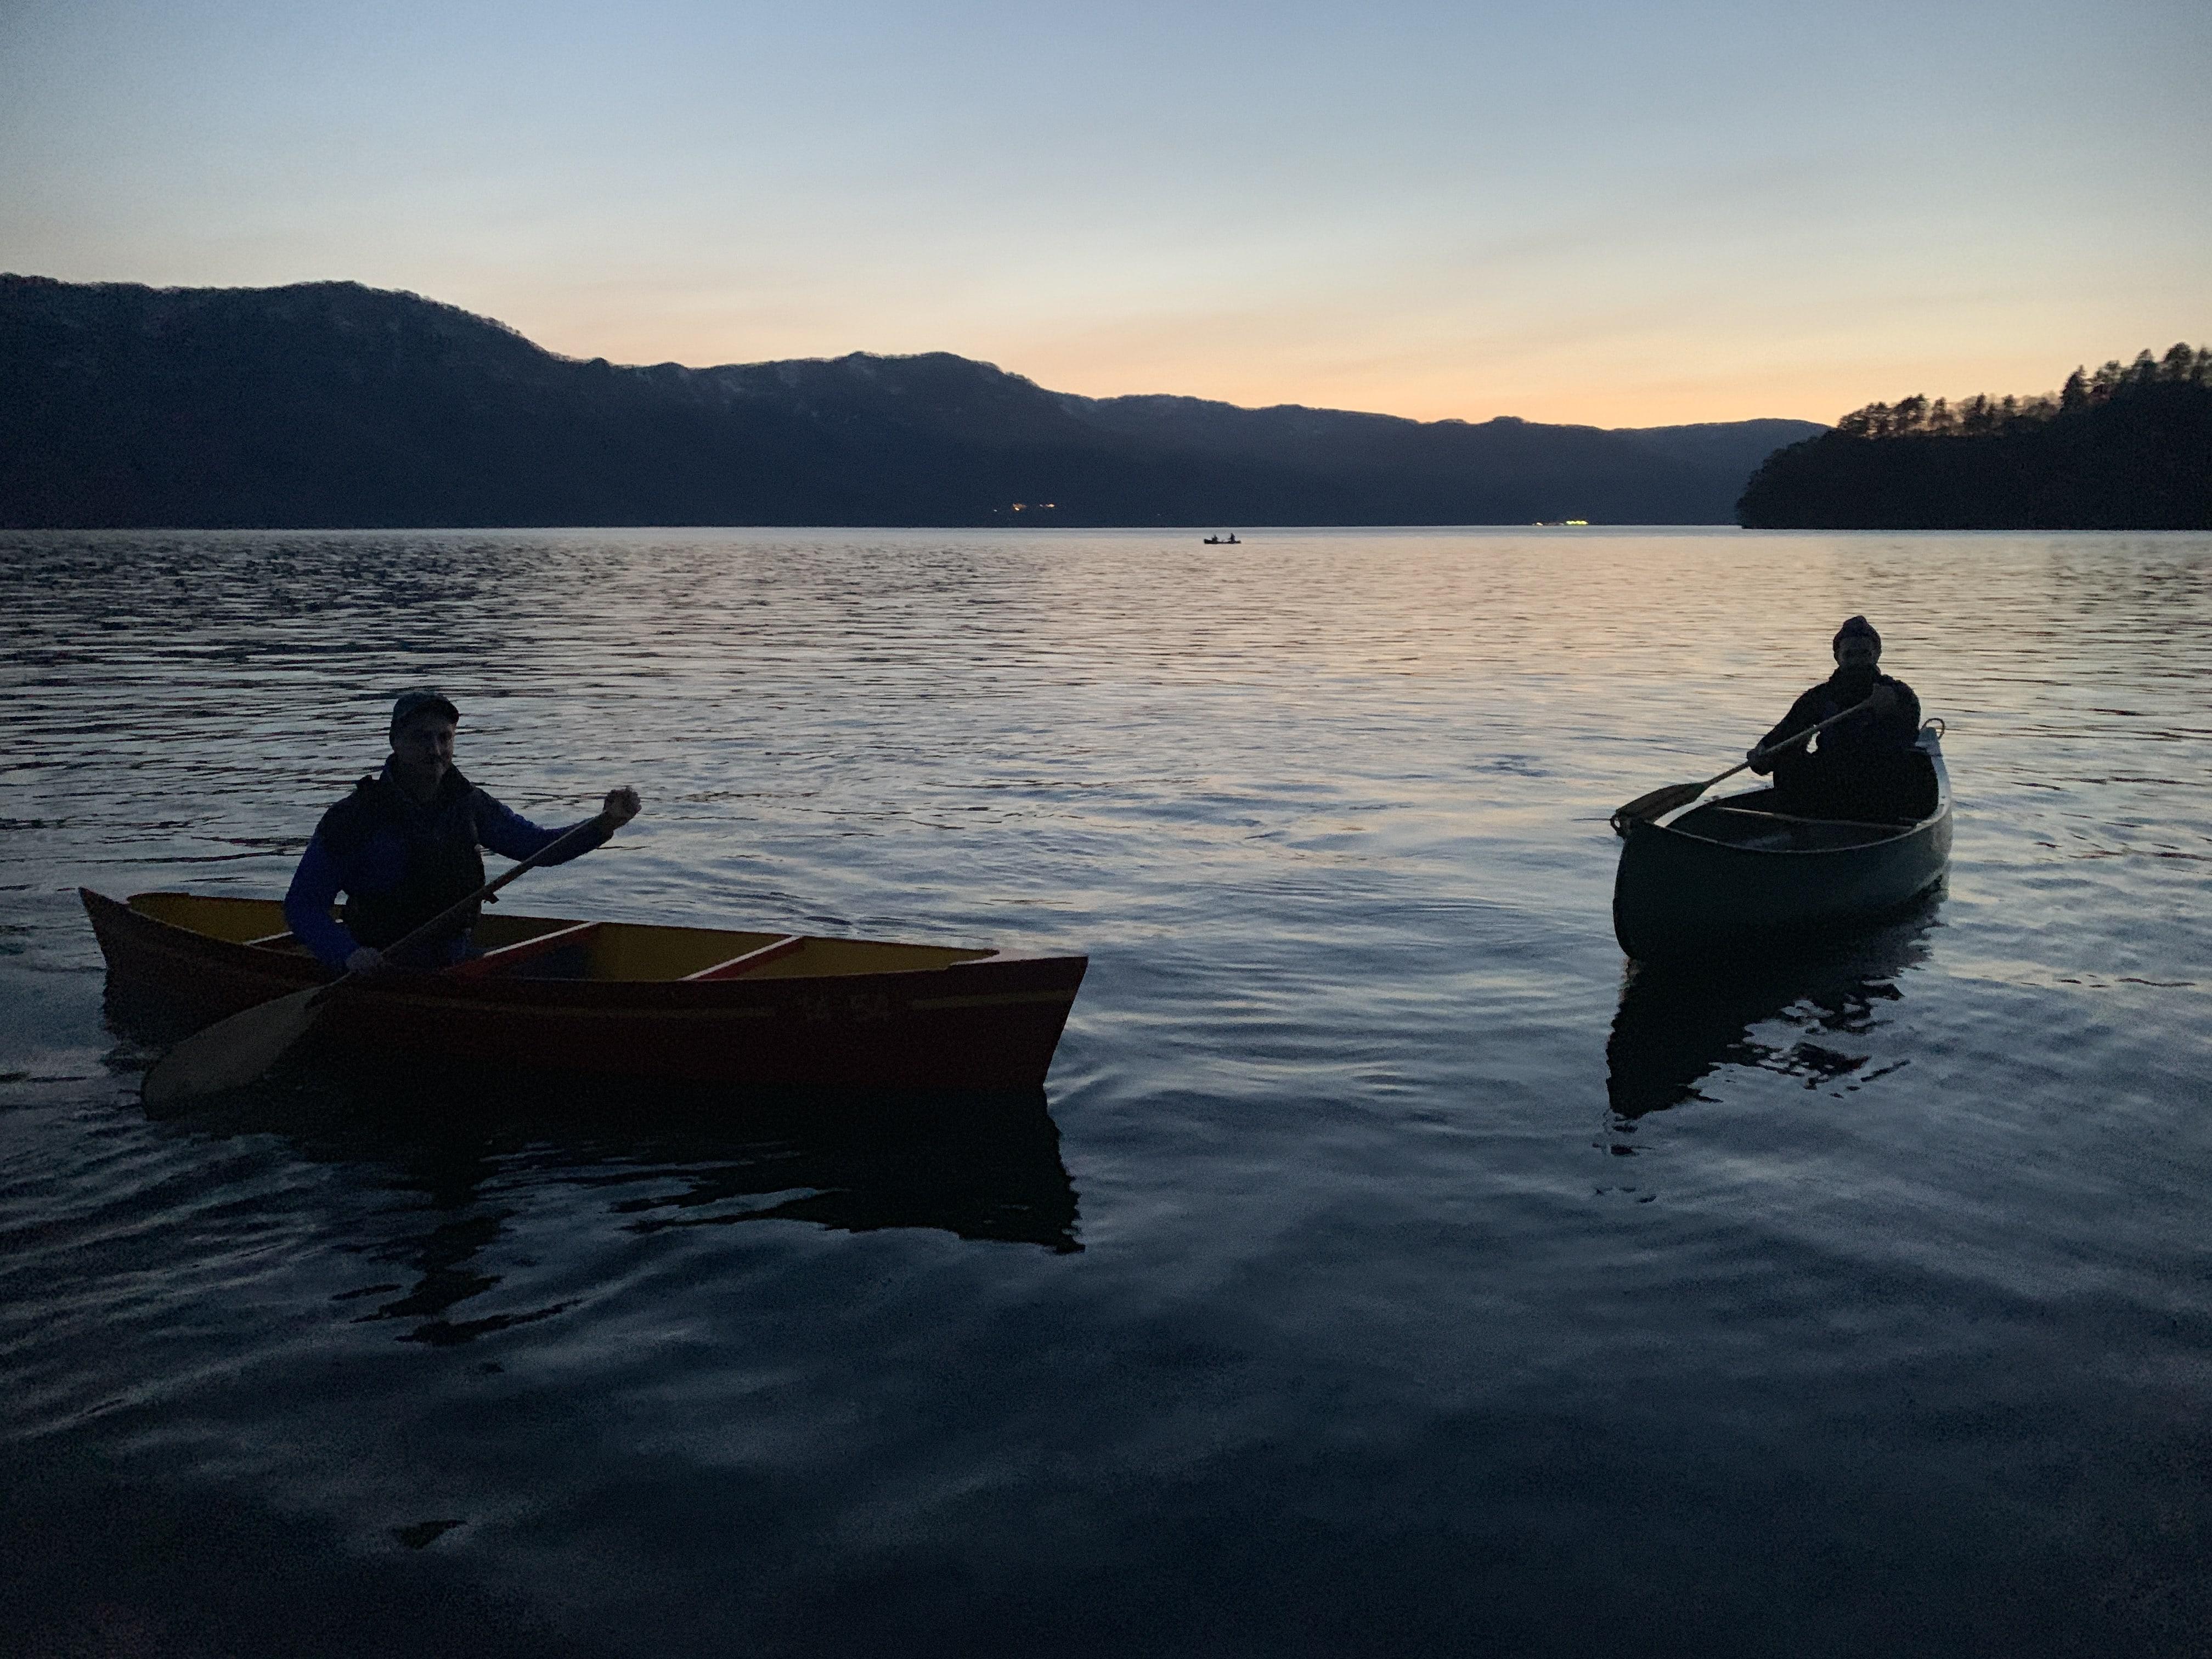 Canoes on Lake Towada